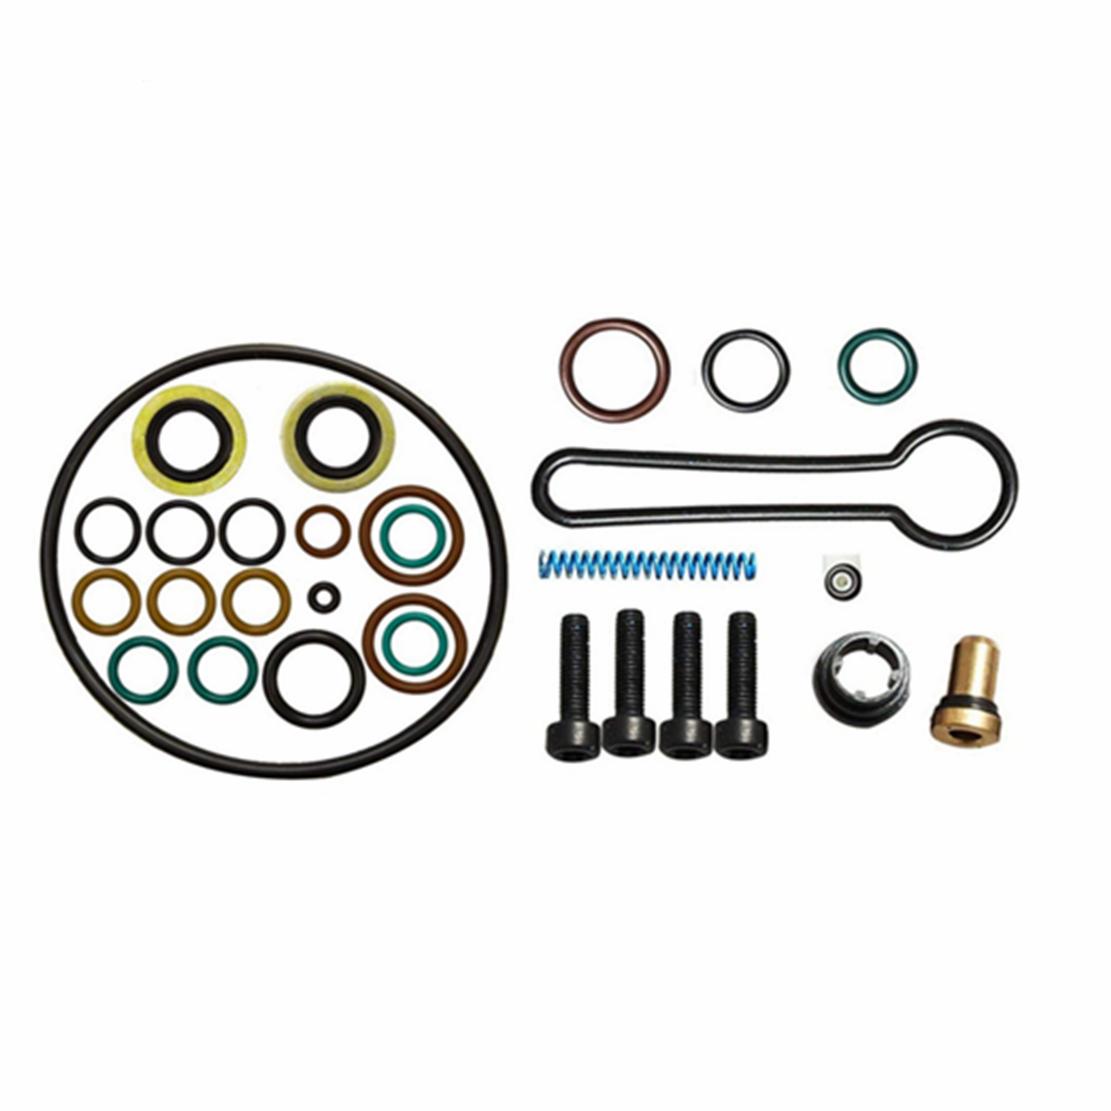 6.0L Powerstroke Diesel 03-07 Fuel Pressure Blue Spring Banjo Bolts Kit BSK2